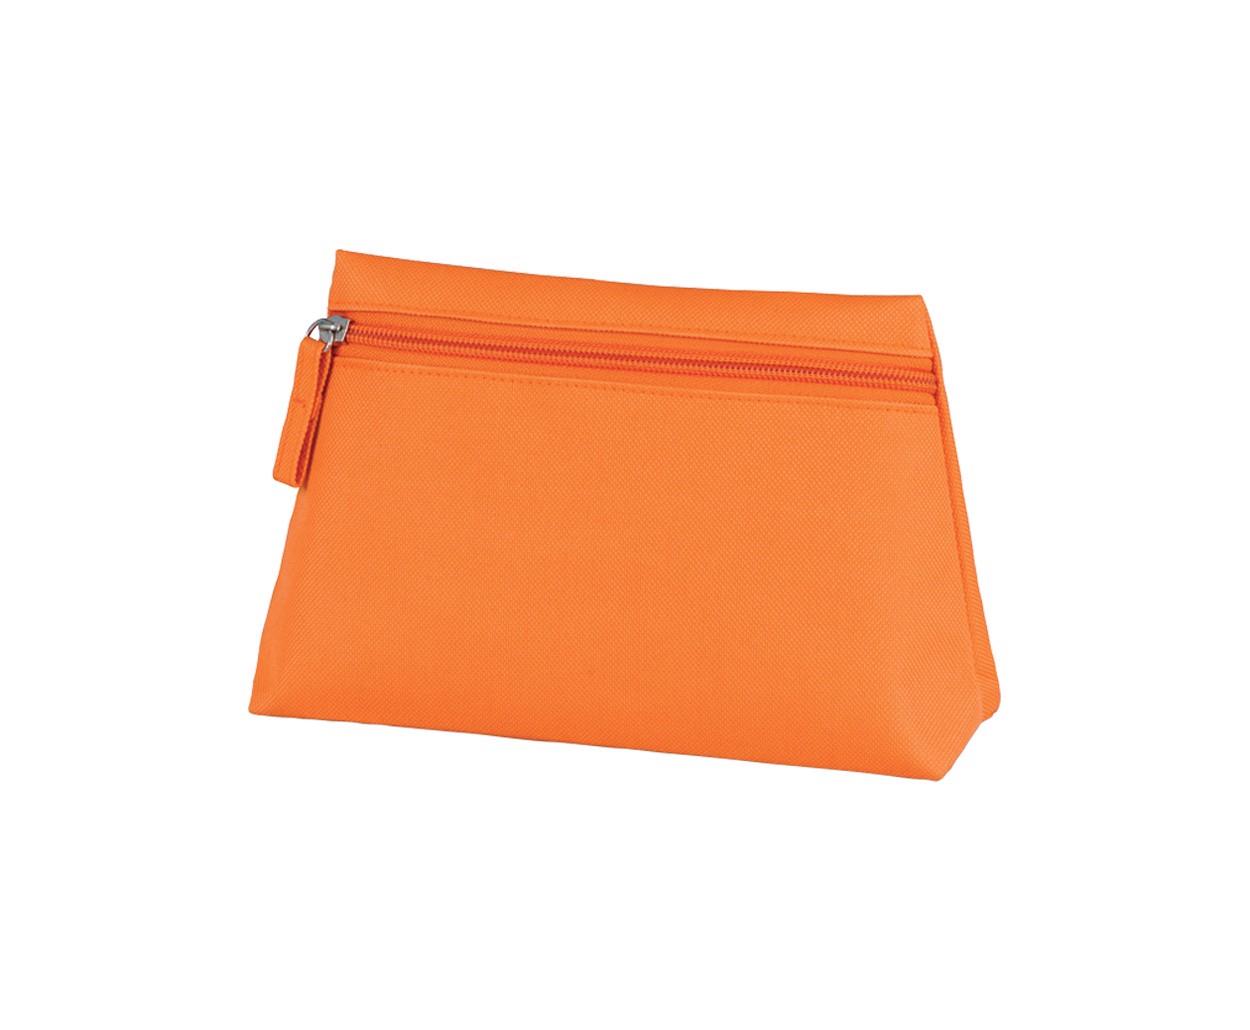 Kosmetická Taška Britney - Oranžová